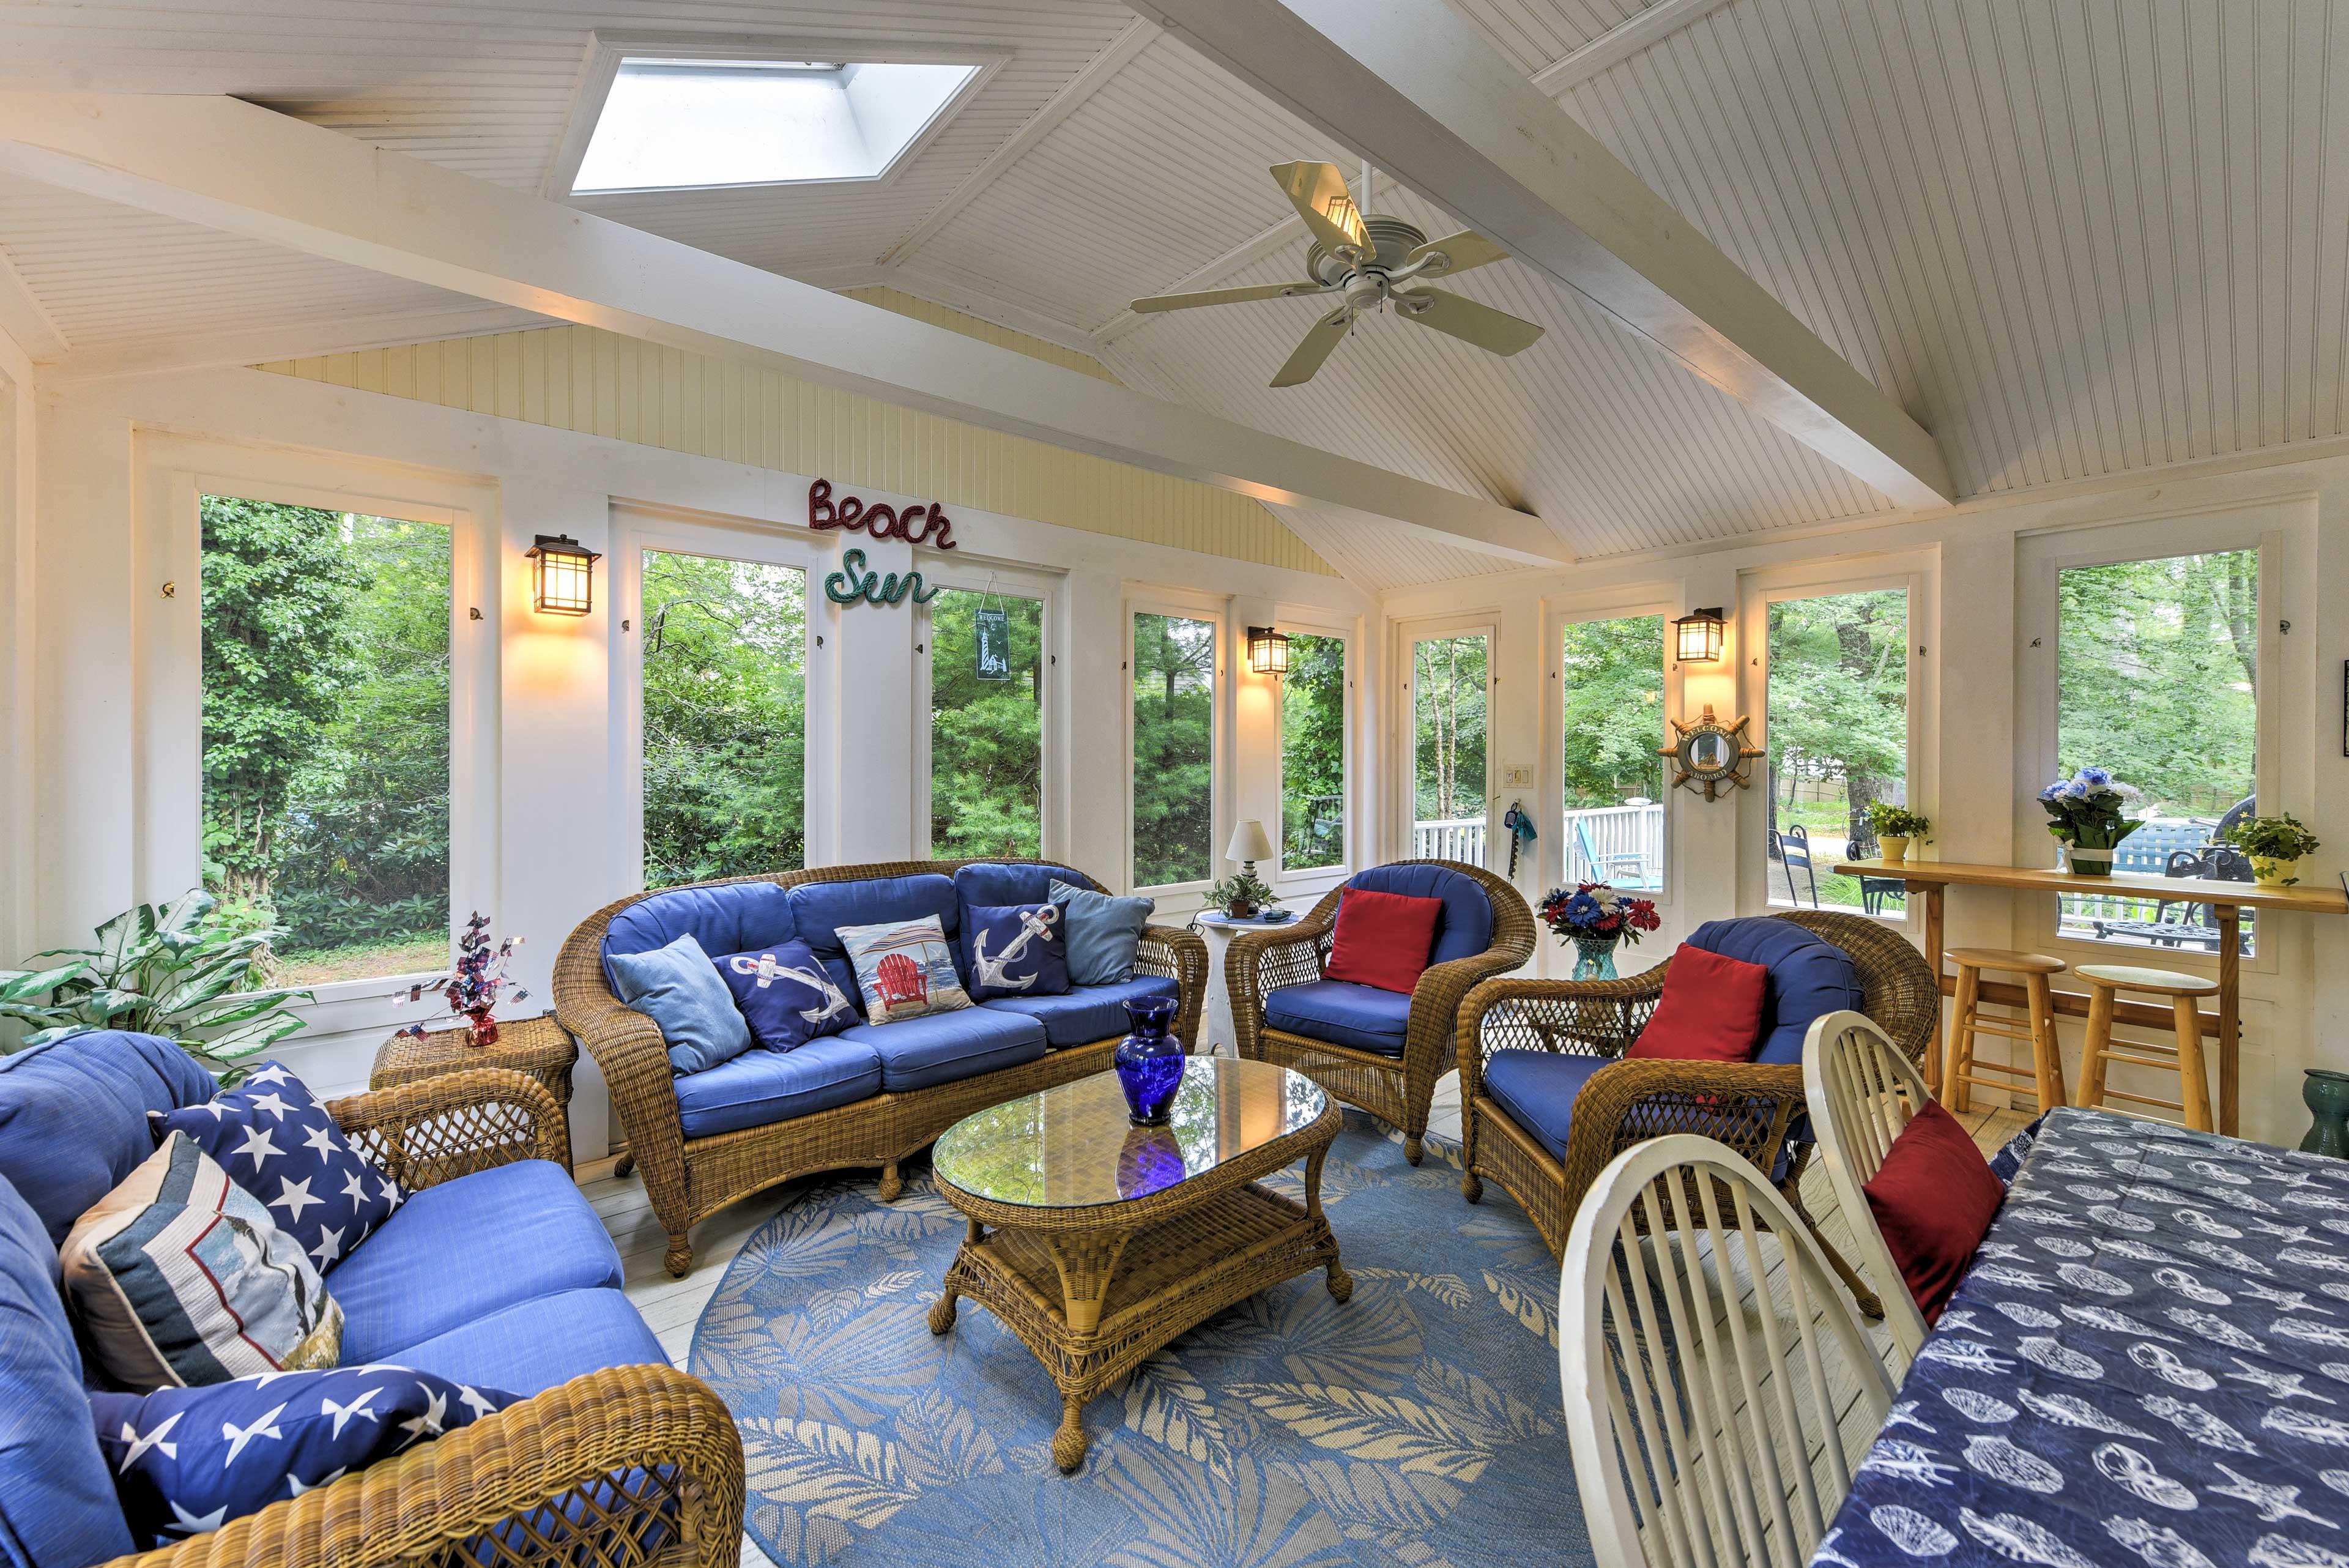 The beautiful sunroom provides fabulous views of the surrounding greenery.